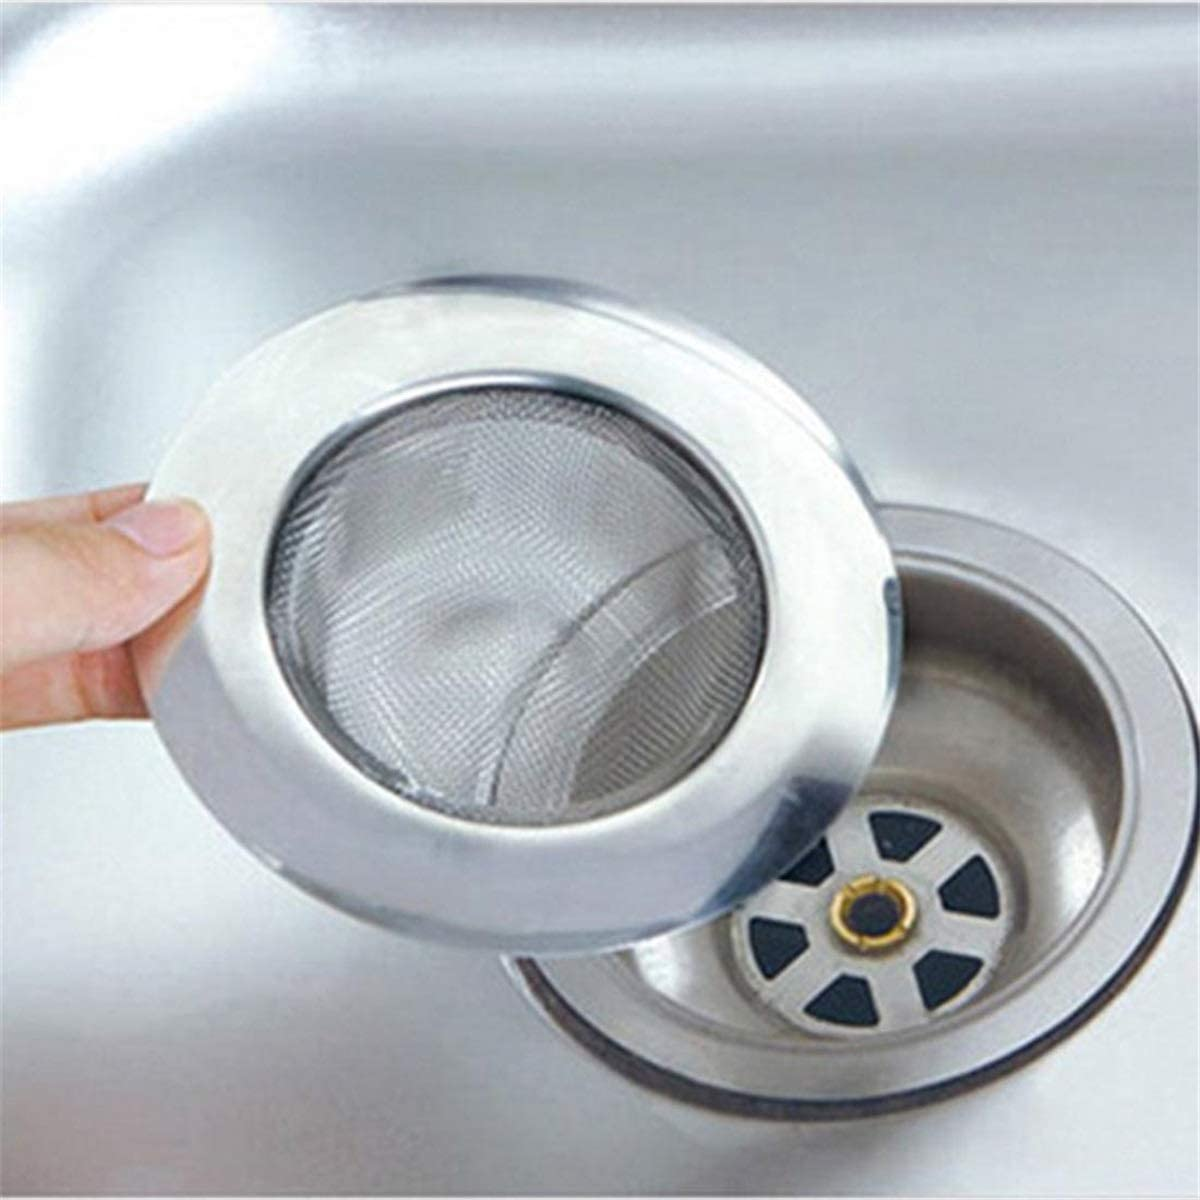 Bath Tub Hair Catcher Stopper Trap Shower Basin Hole Plug Strainer Filter BIUK